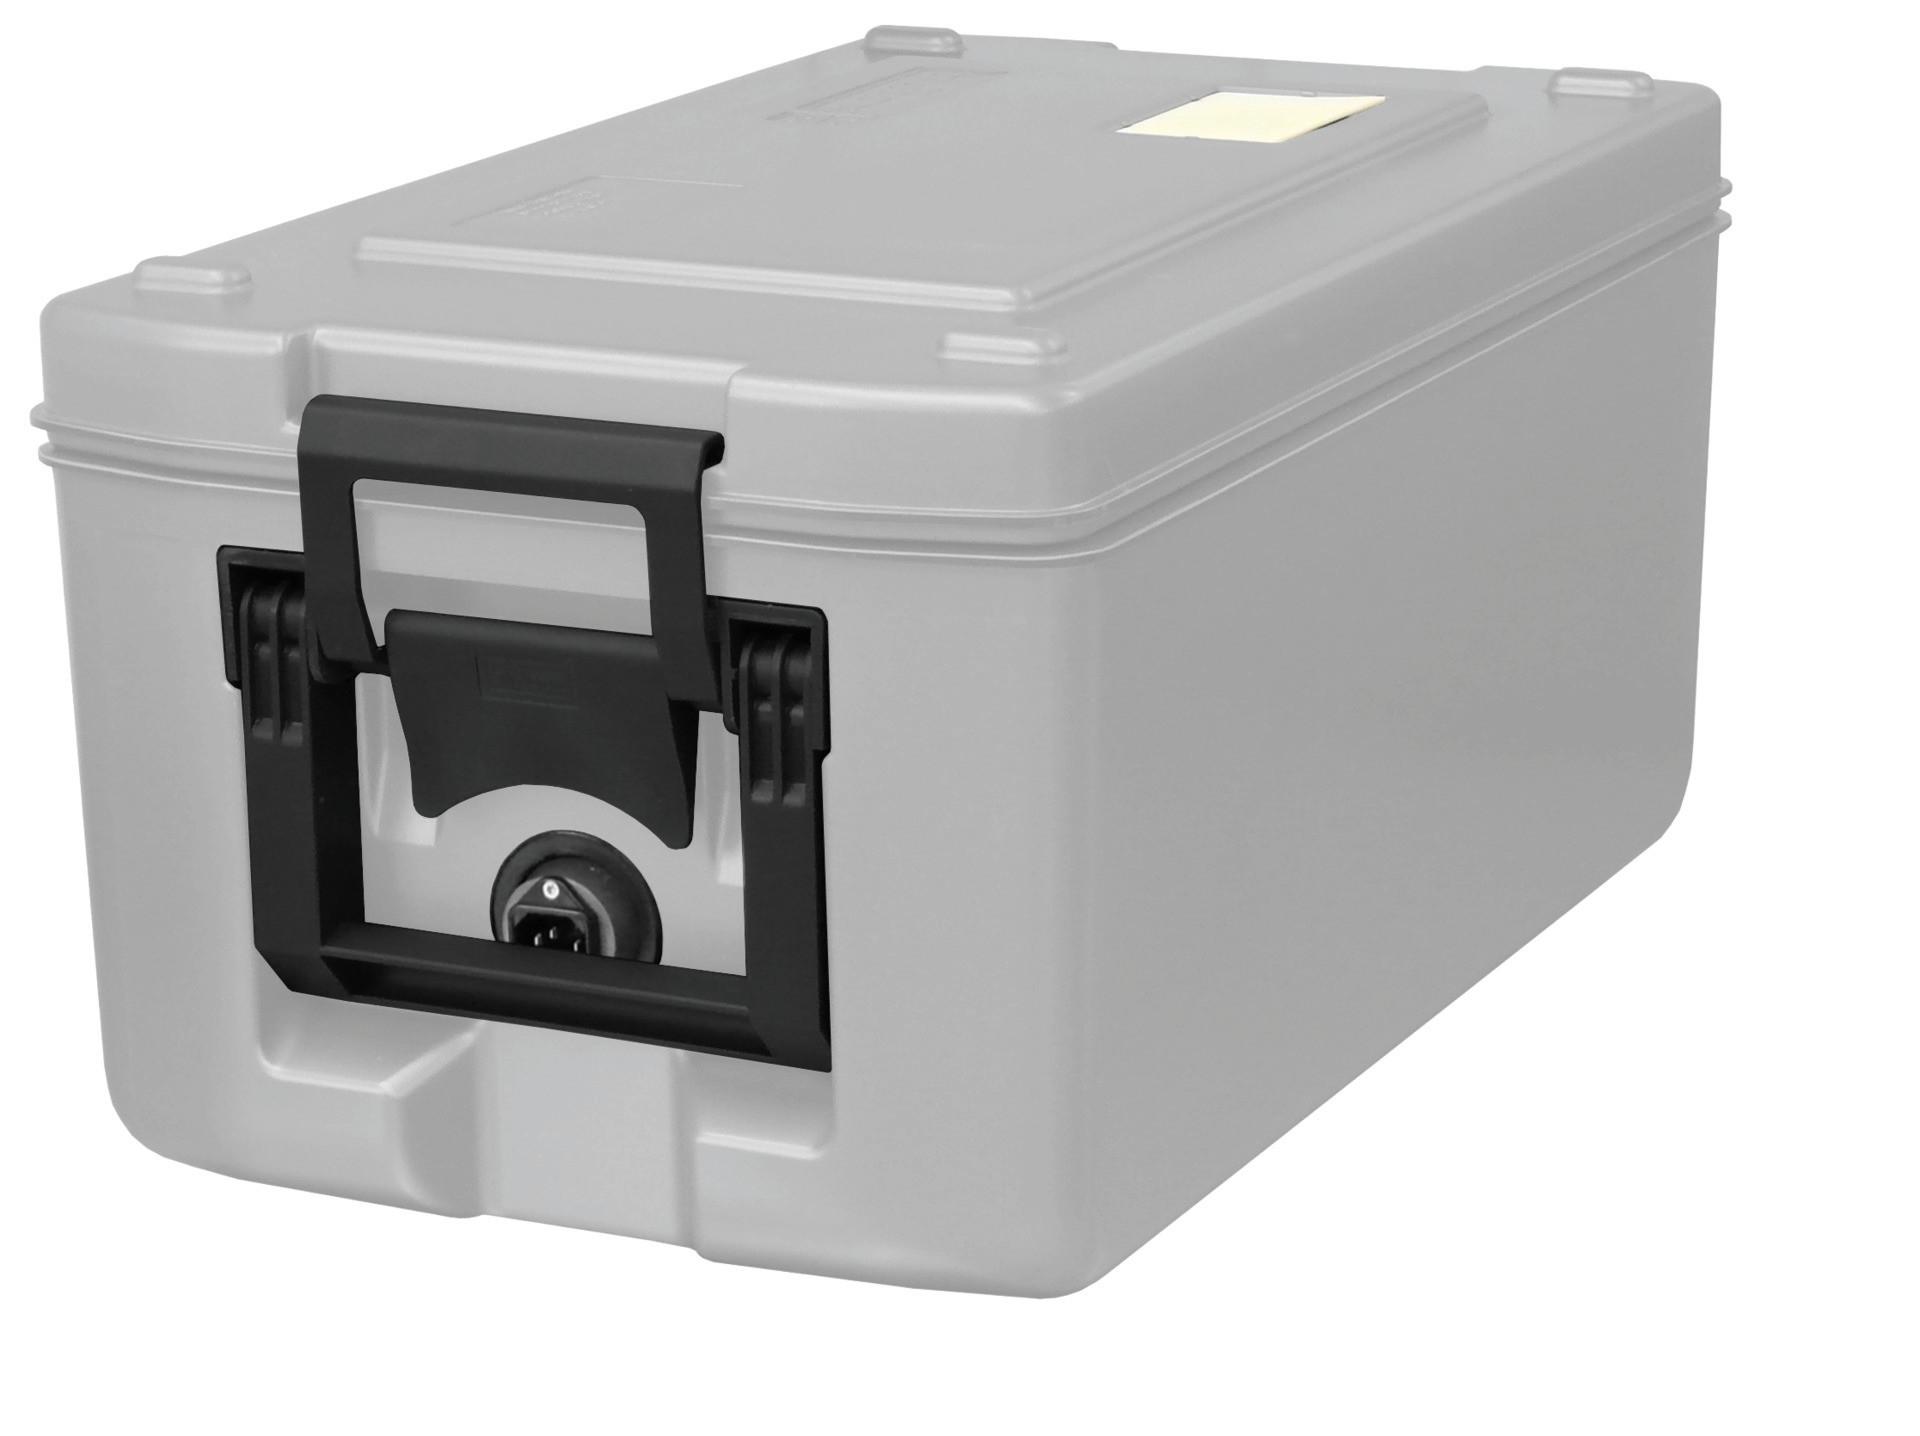 Transportbehälter 26 l beheizt lichtgrau 630 x 370 x 308 mm